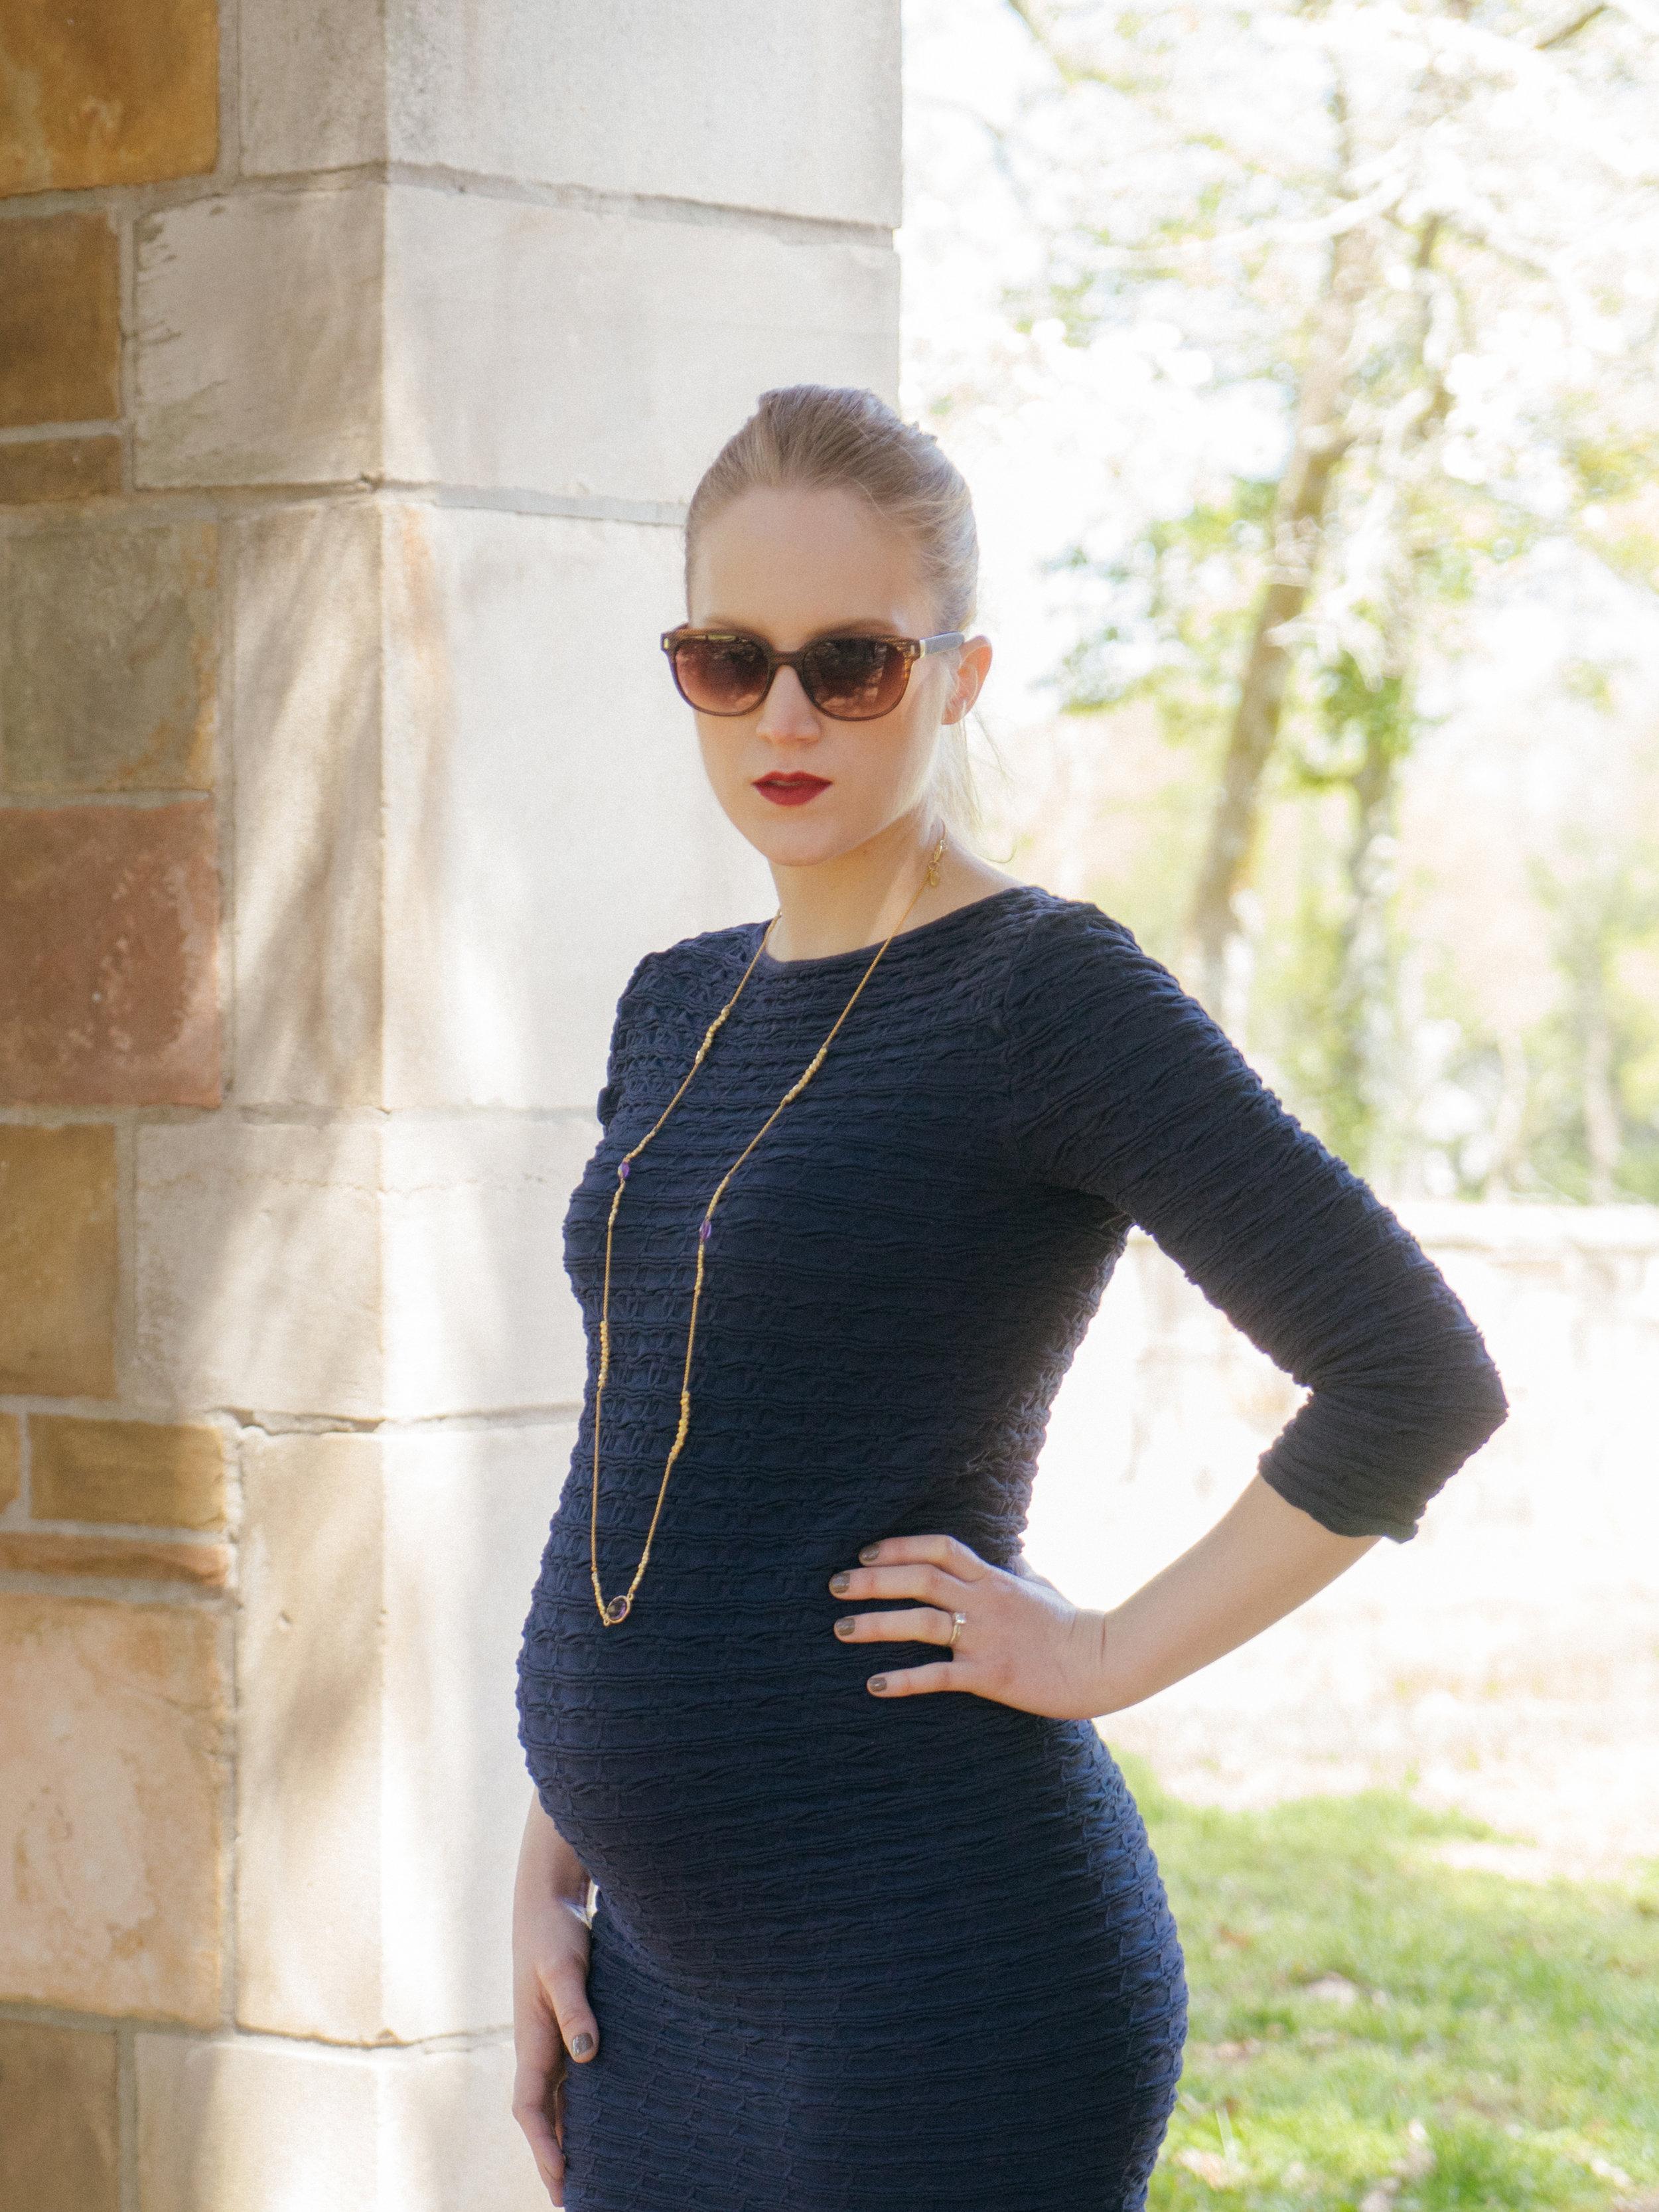 BUMP style Box Tees by Tina Crinkle Maternity Dress